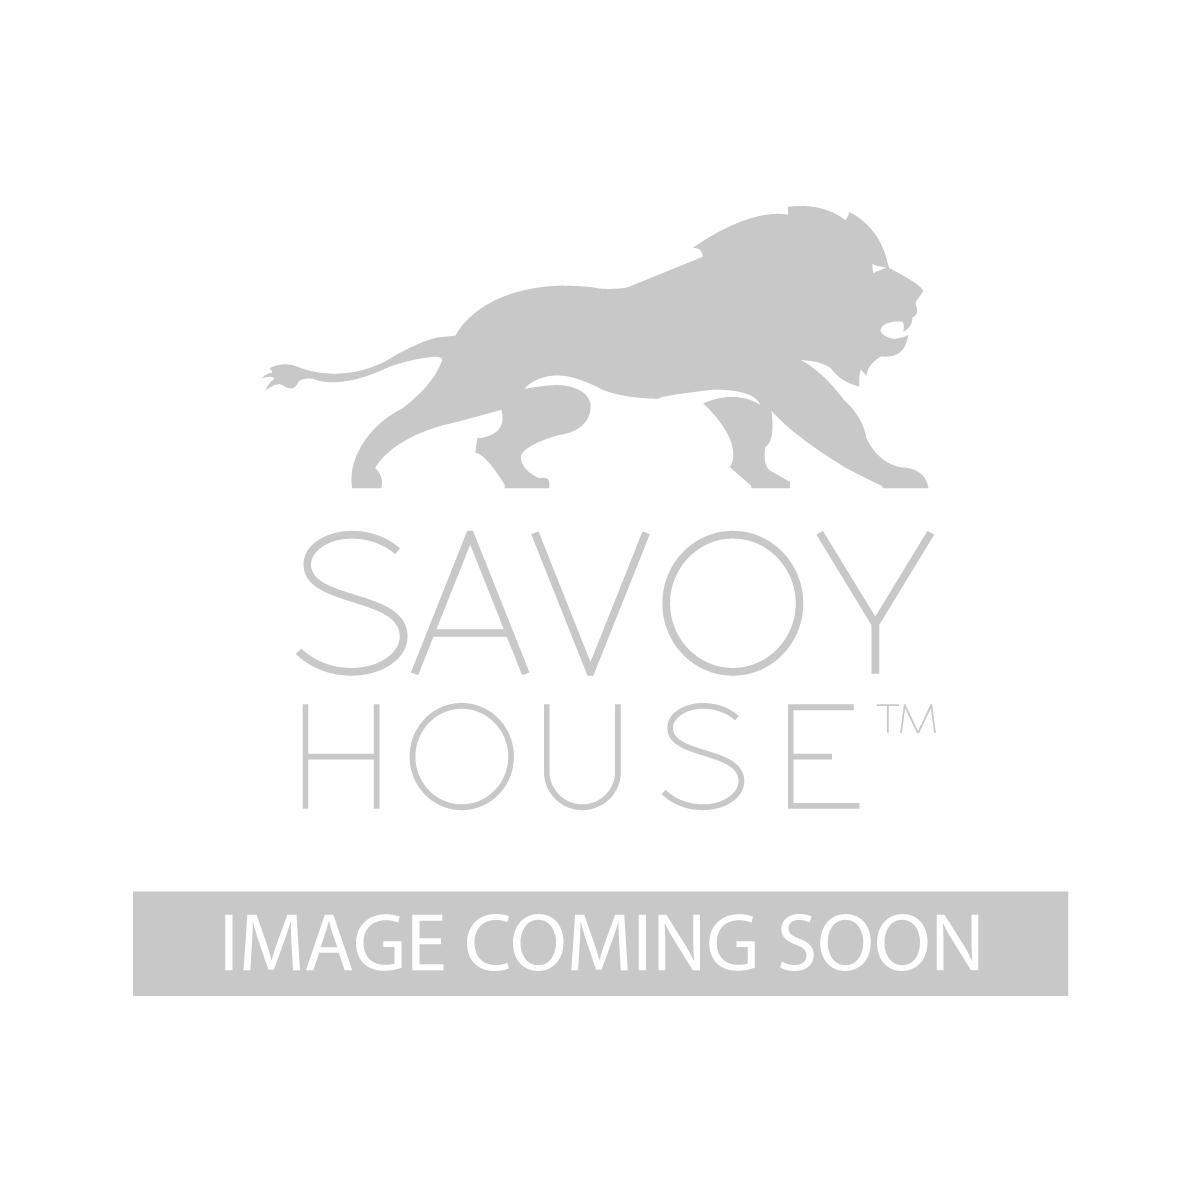 Drake 1 Light Adjustable Sconce  sc 1 st  Savoy House & 9-9131CP-1-13 Drake 1 Light Adjustable Sconce by Savoy House